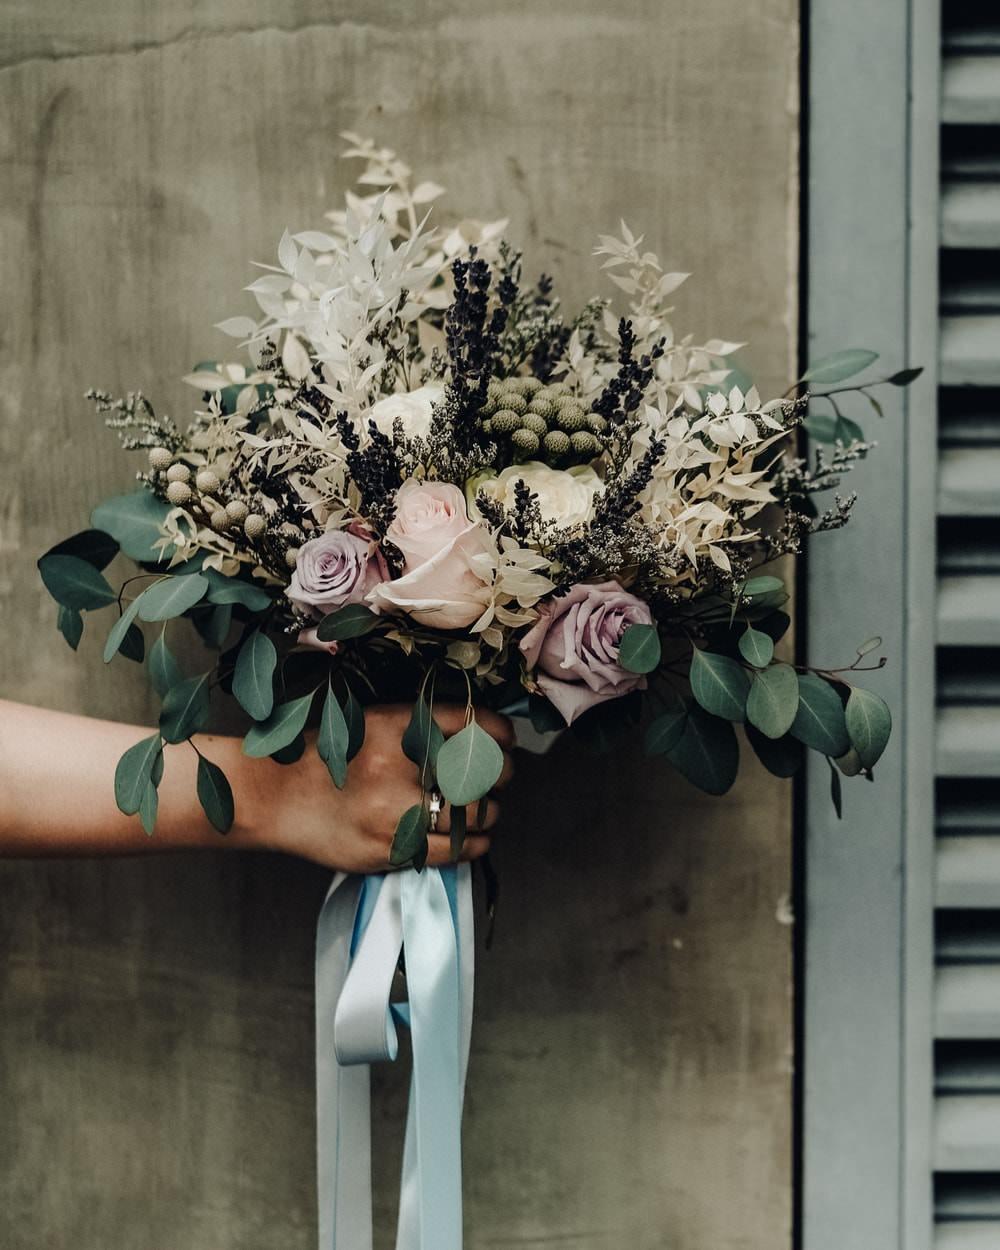 Bouquet Flowers Bride Bridal Eucalyptus Pink Rose Philippines Wedding The Backyard Studios